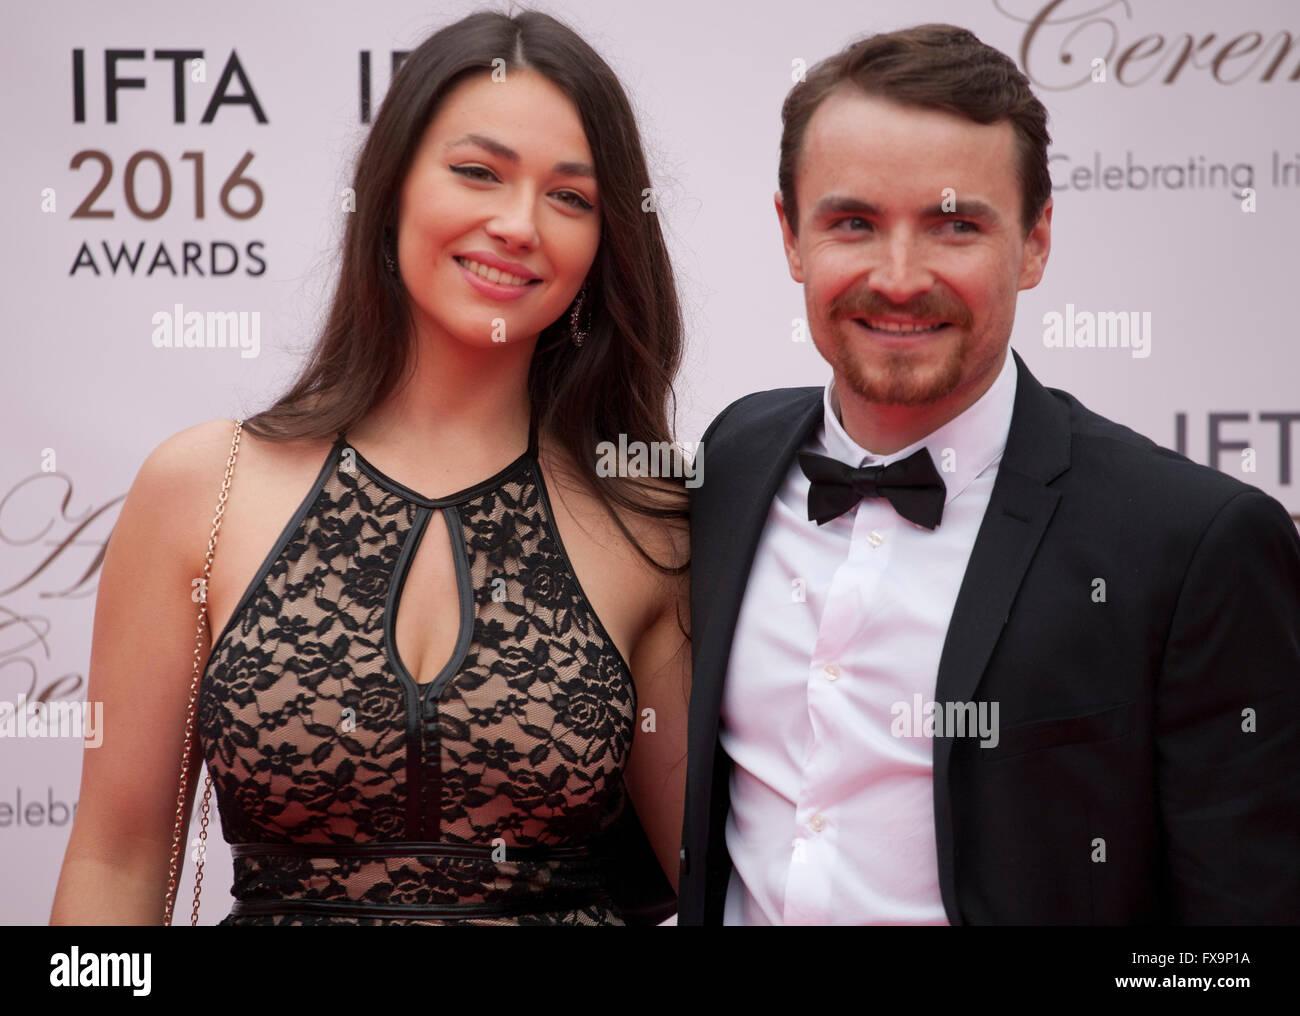 Nadia Milliken and Martin McCann at the IFTA Film & Drama Awards (The Irish Film & Television Academy) Dublin - Stock Image